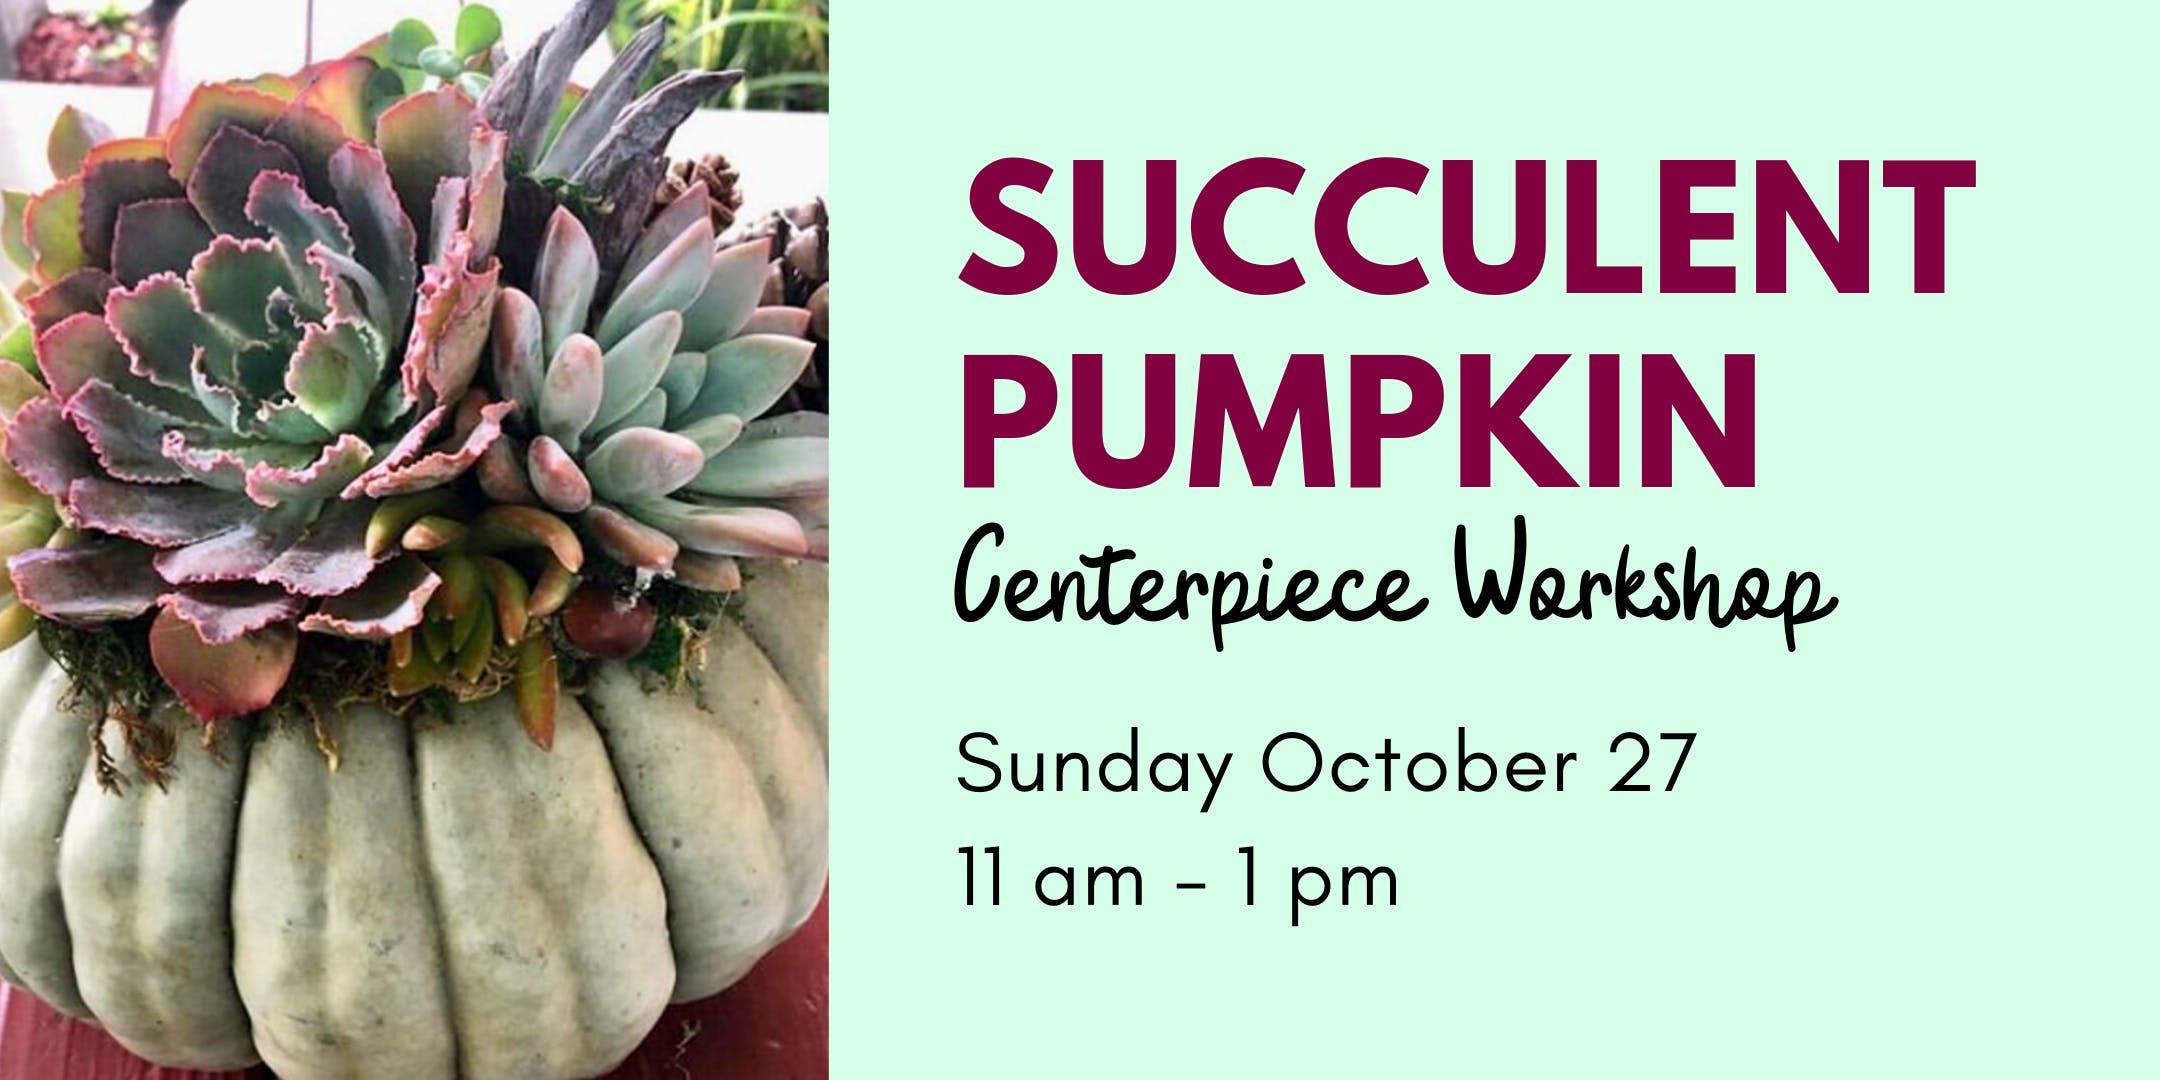 Succulent Pumpkin Centerpiece Workshop - 10/27